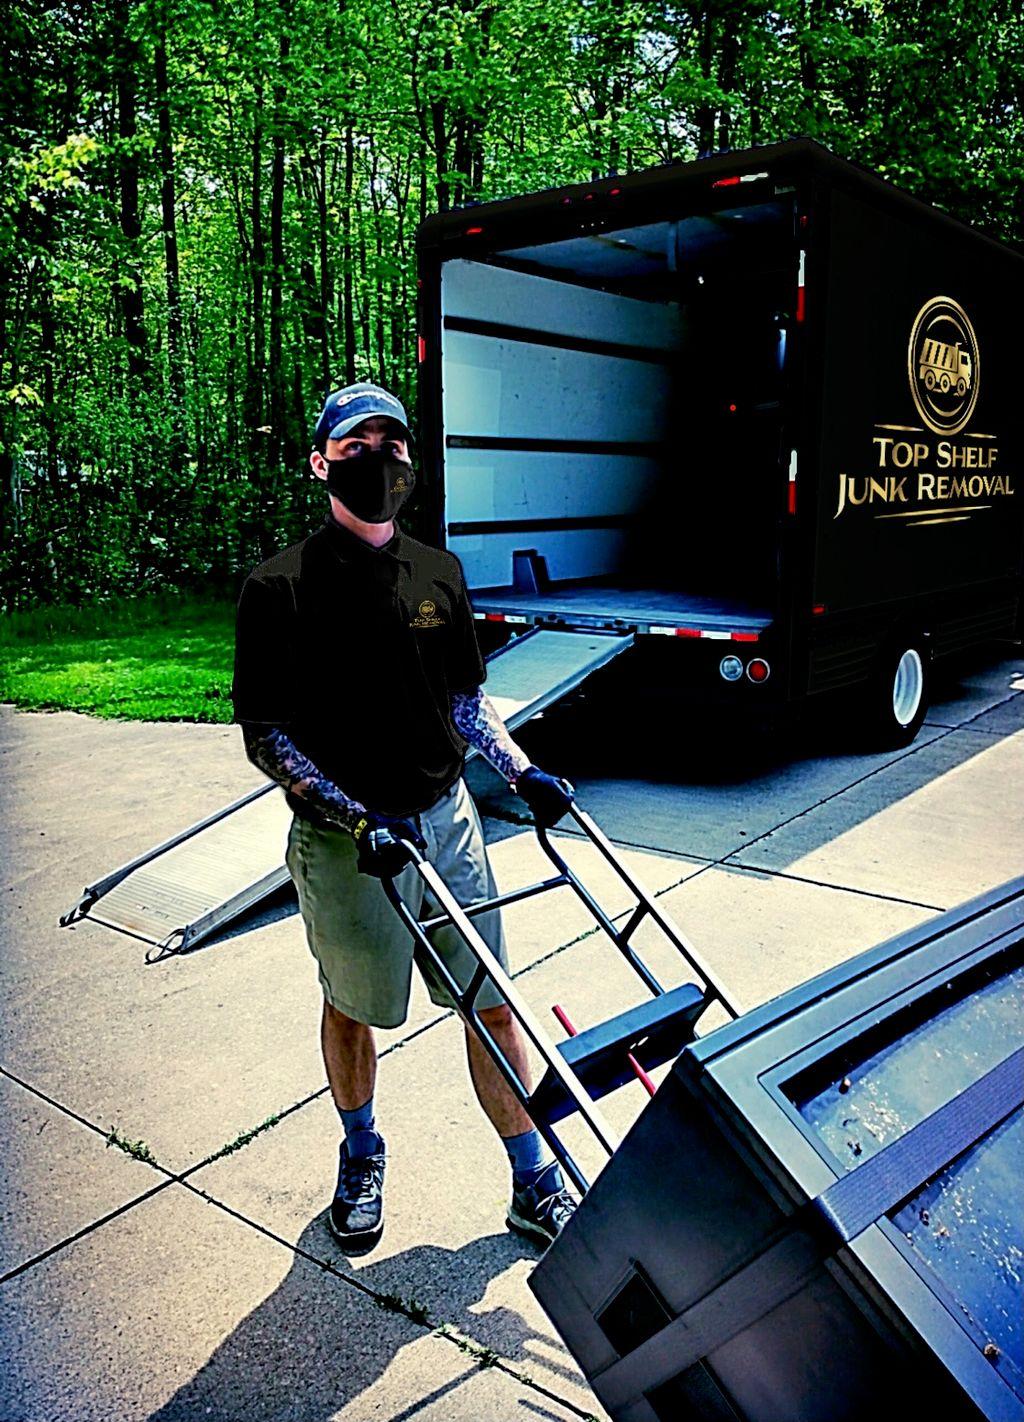 Top Shelf Junk Removal, LLC